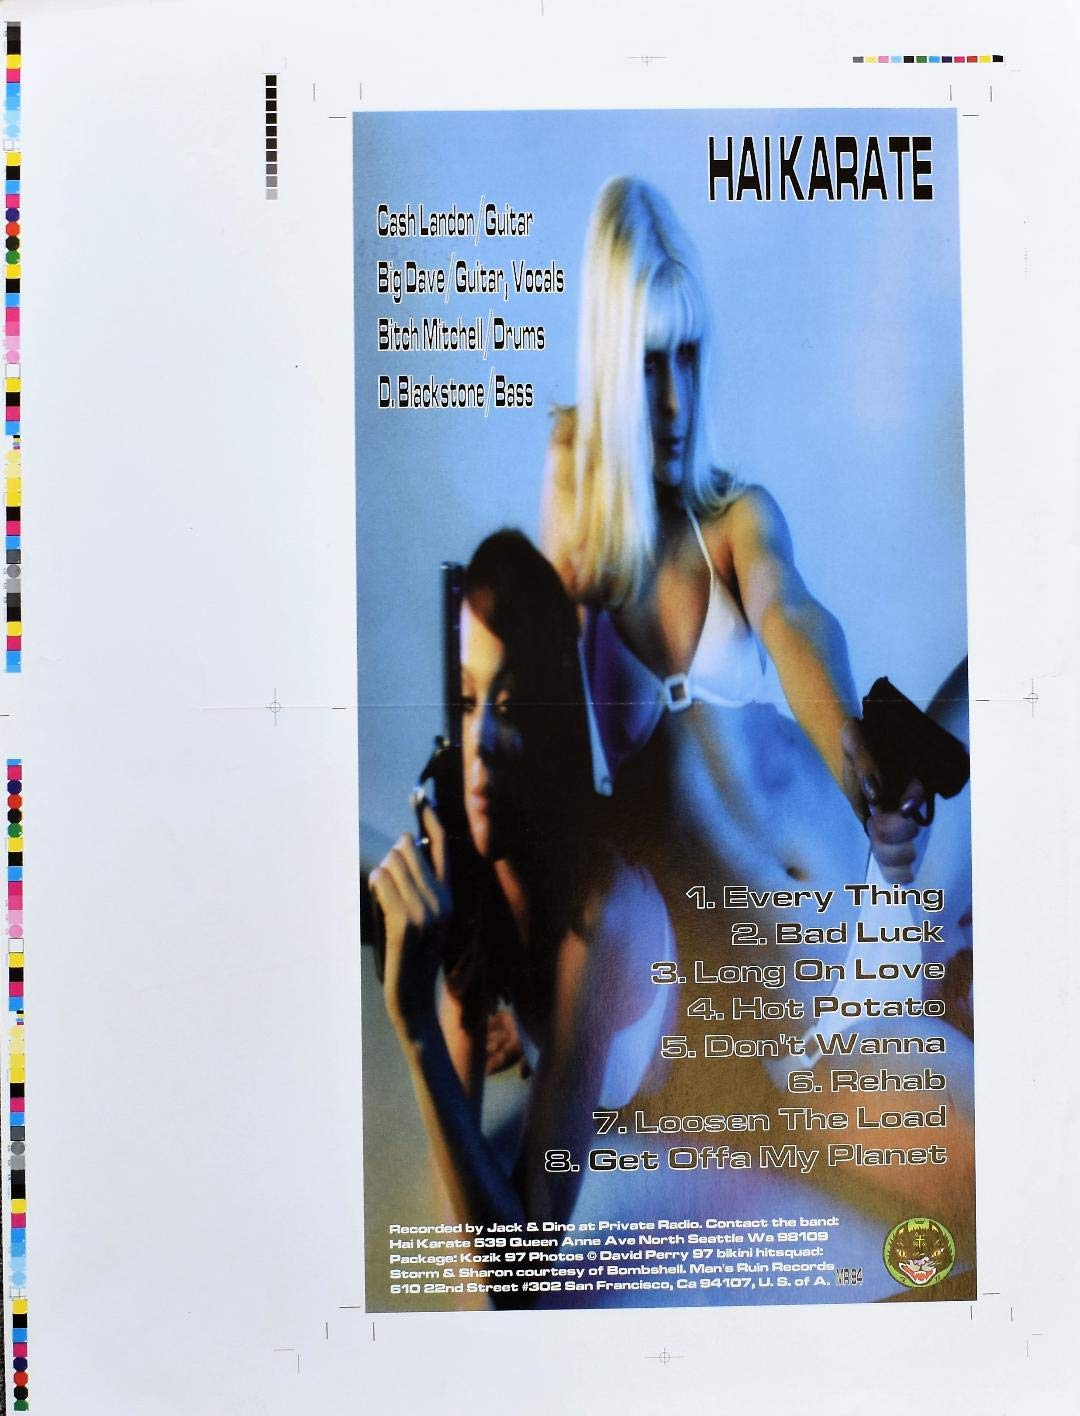 Hai Karate Album Uncut Poster Proof Frank Kozik Designed 1998 by Visible Vibrations